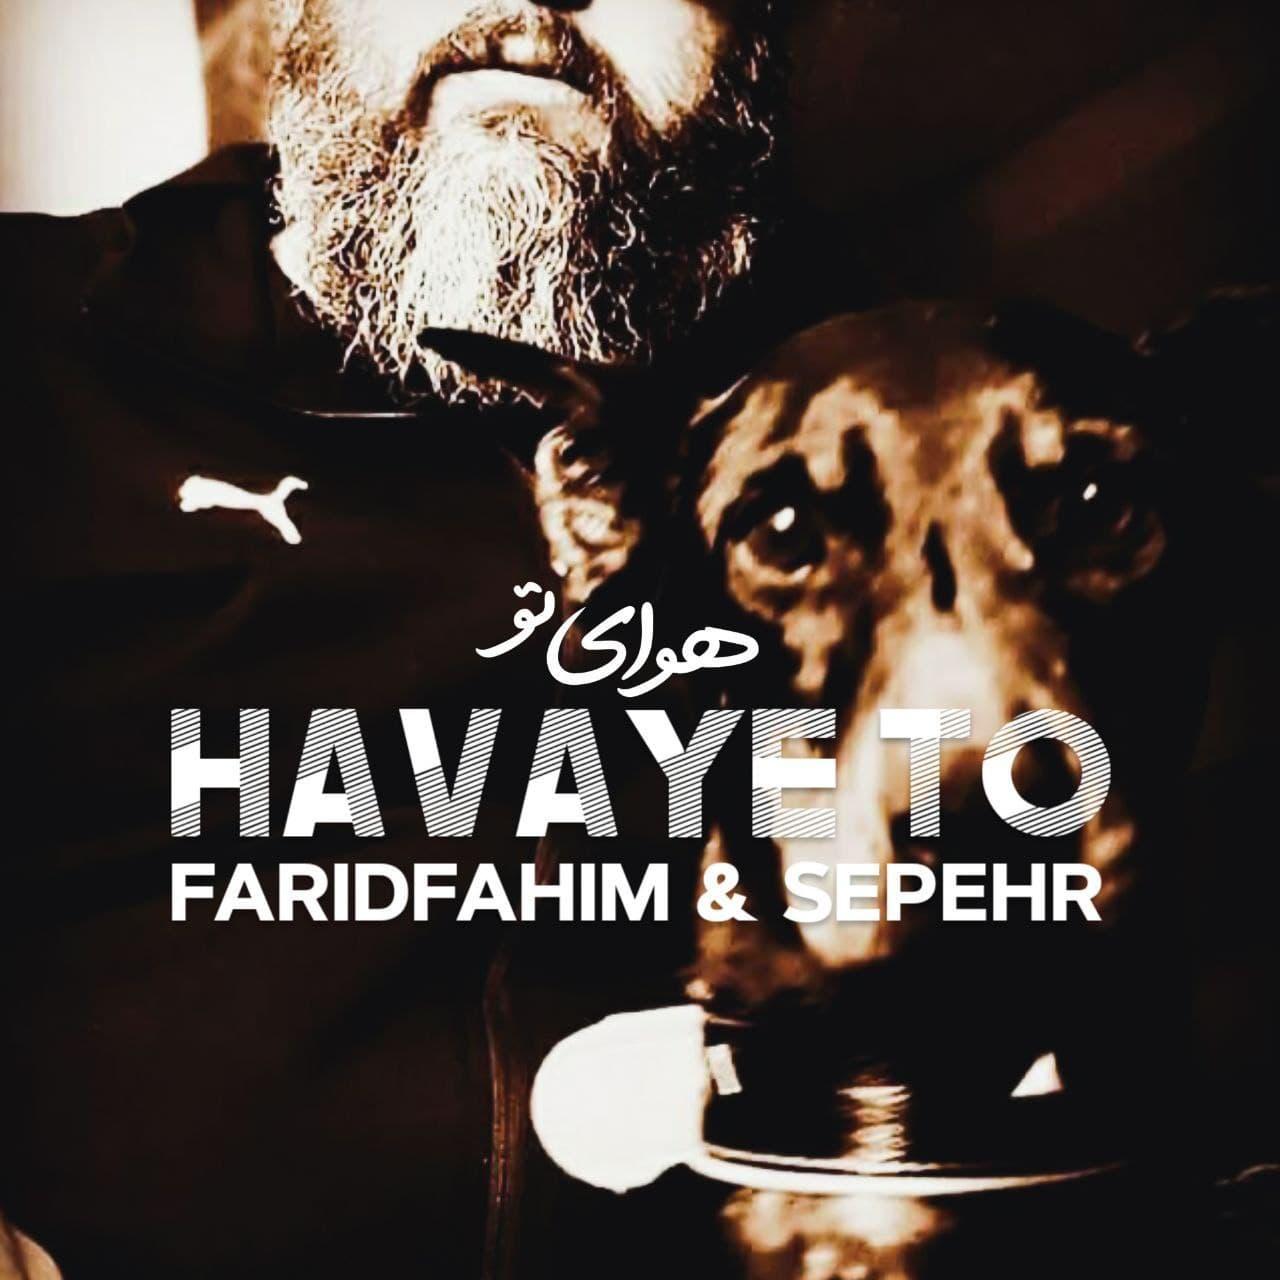 Faridfahim & Sepehr – Havaye To